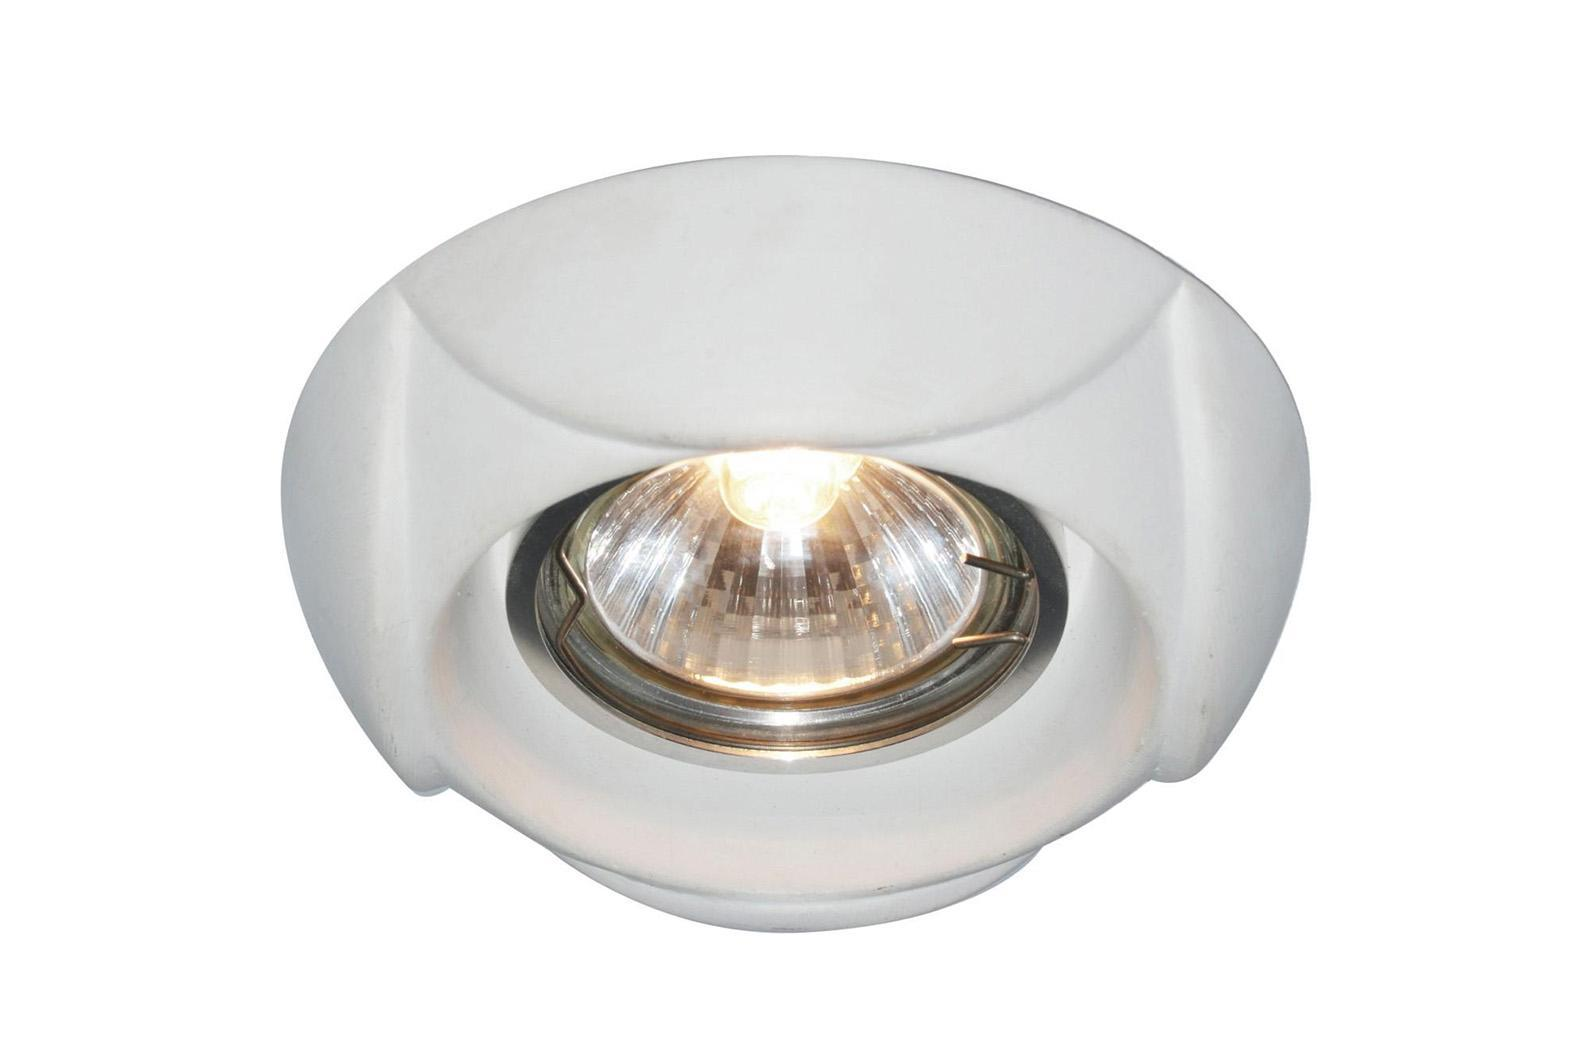 A5241PL-1WH CRATERE Встраиваемый светильникA5241PL-1WH1x50W; патроны GU10 и G5,3 в комплекте Материал: Арматура: КерамикаРазмер: 105x105x45Цвет: Белый